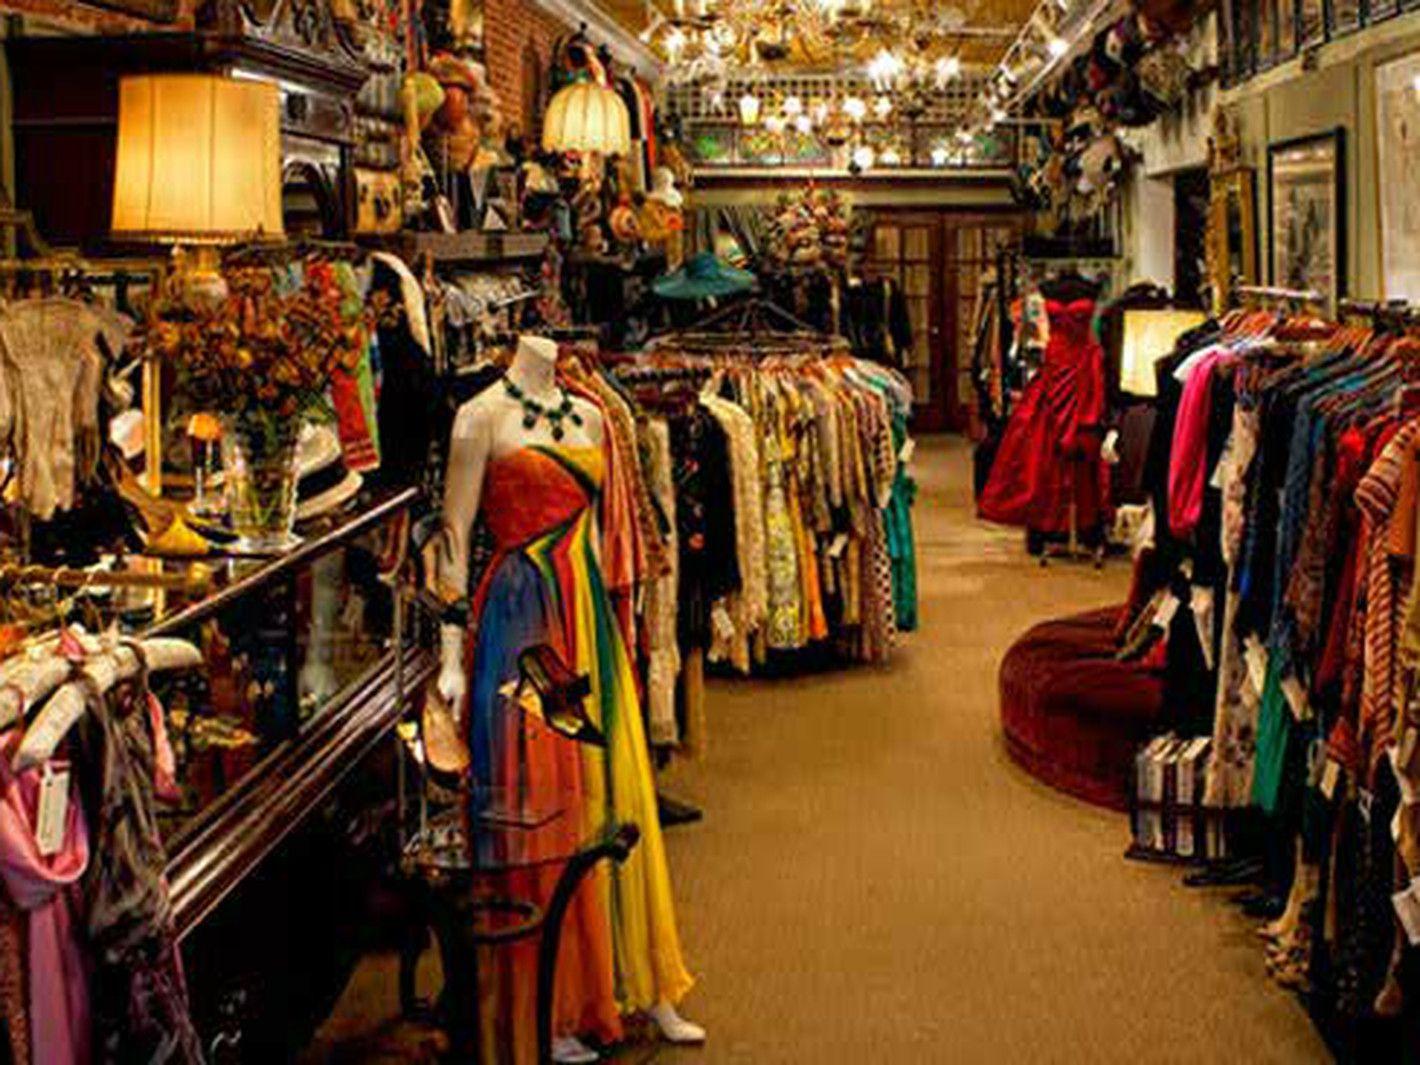 New York City S 38 Best Vintage Stores In 2020 Vintage Shops New York New York Vintage Stores Vintage Shops Nyc